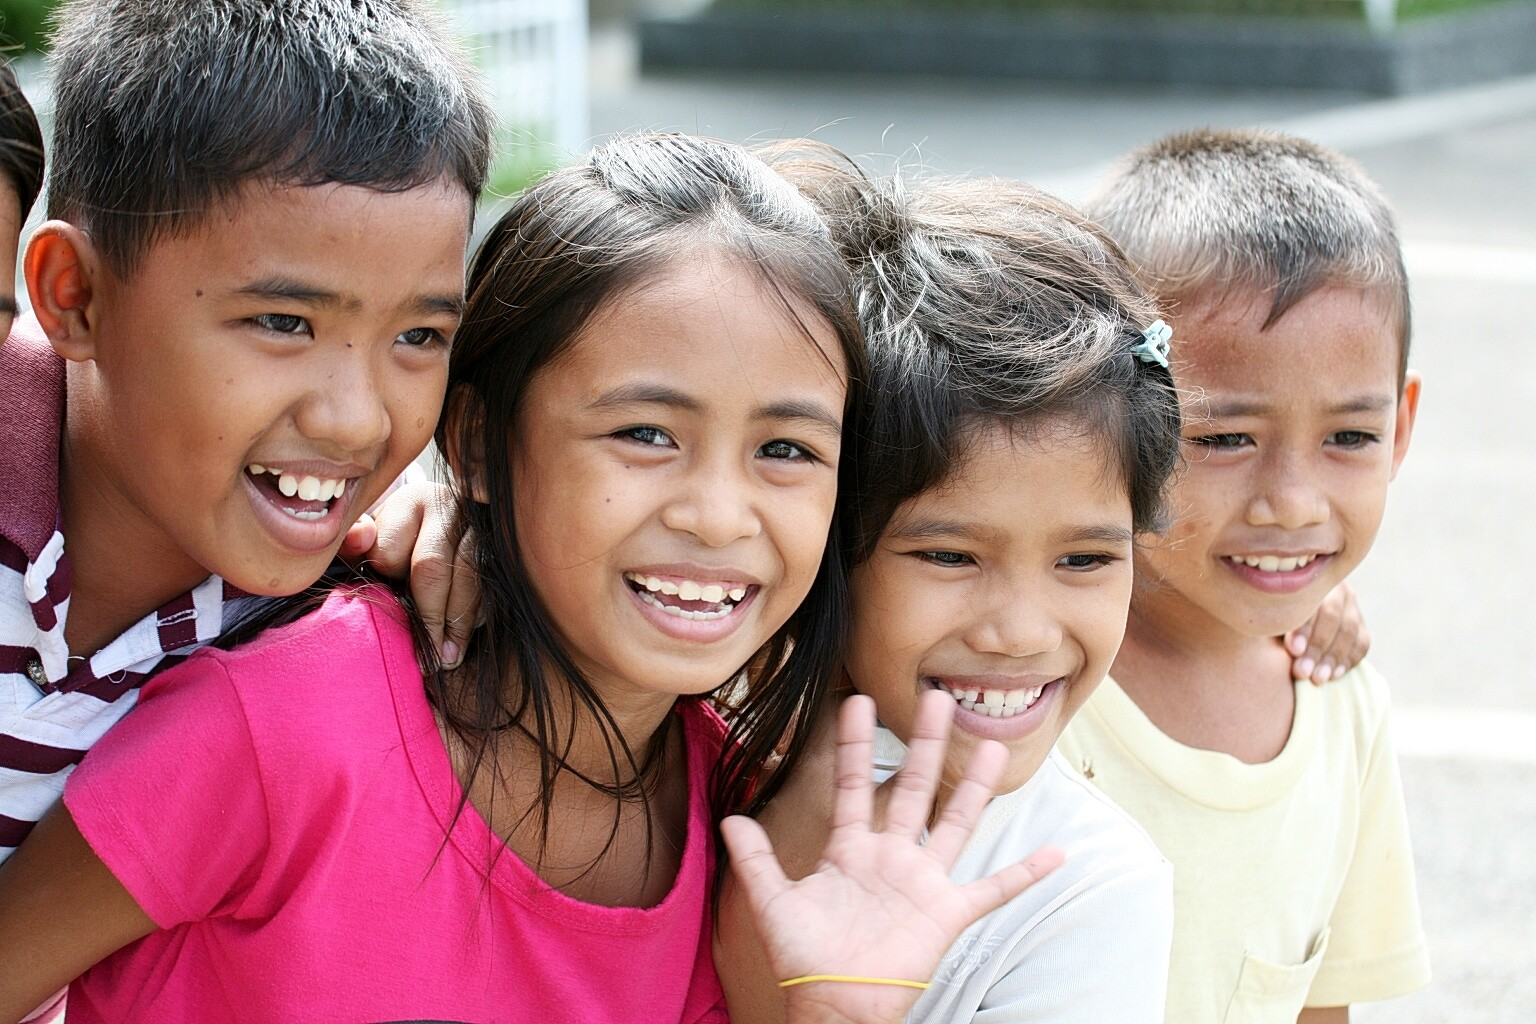 filipino kids - photo #4